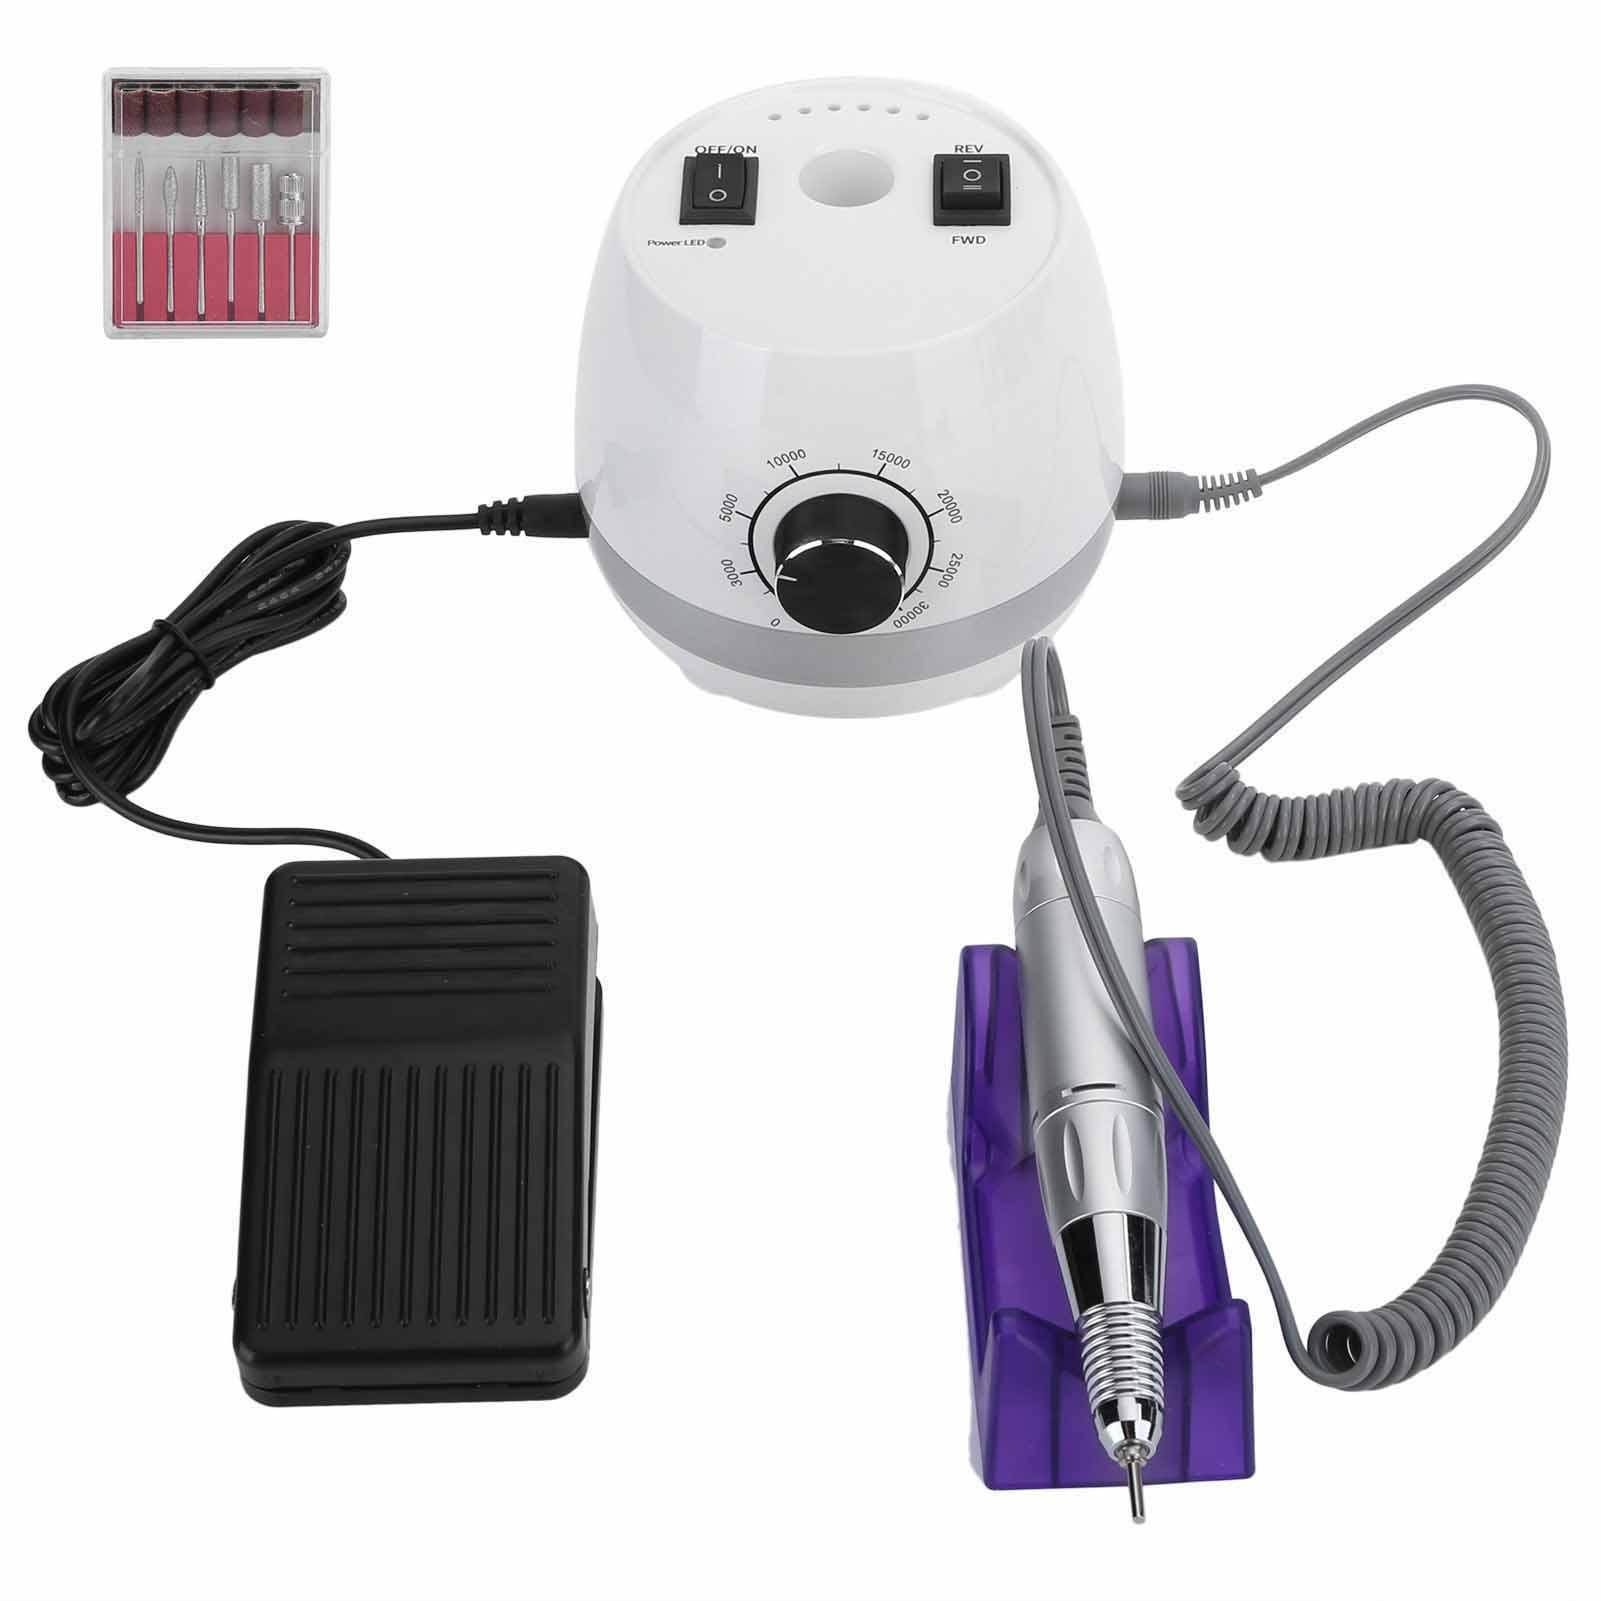 Indexbild 14 - Polishing Nail Drill Machine Repairing Nail Polisher Grinding Electric 35000RPM